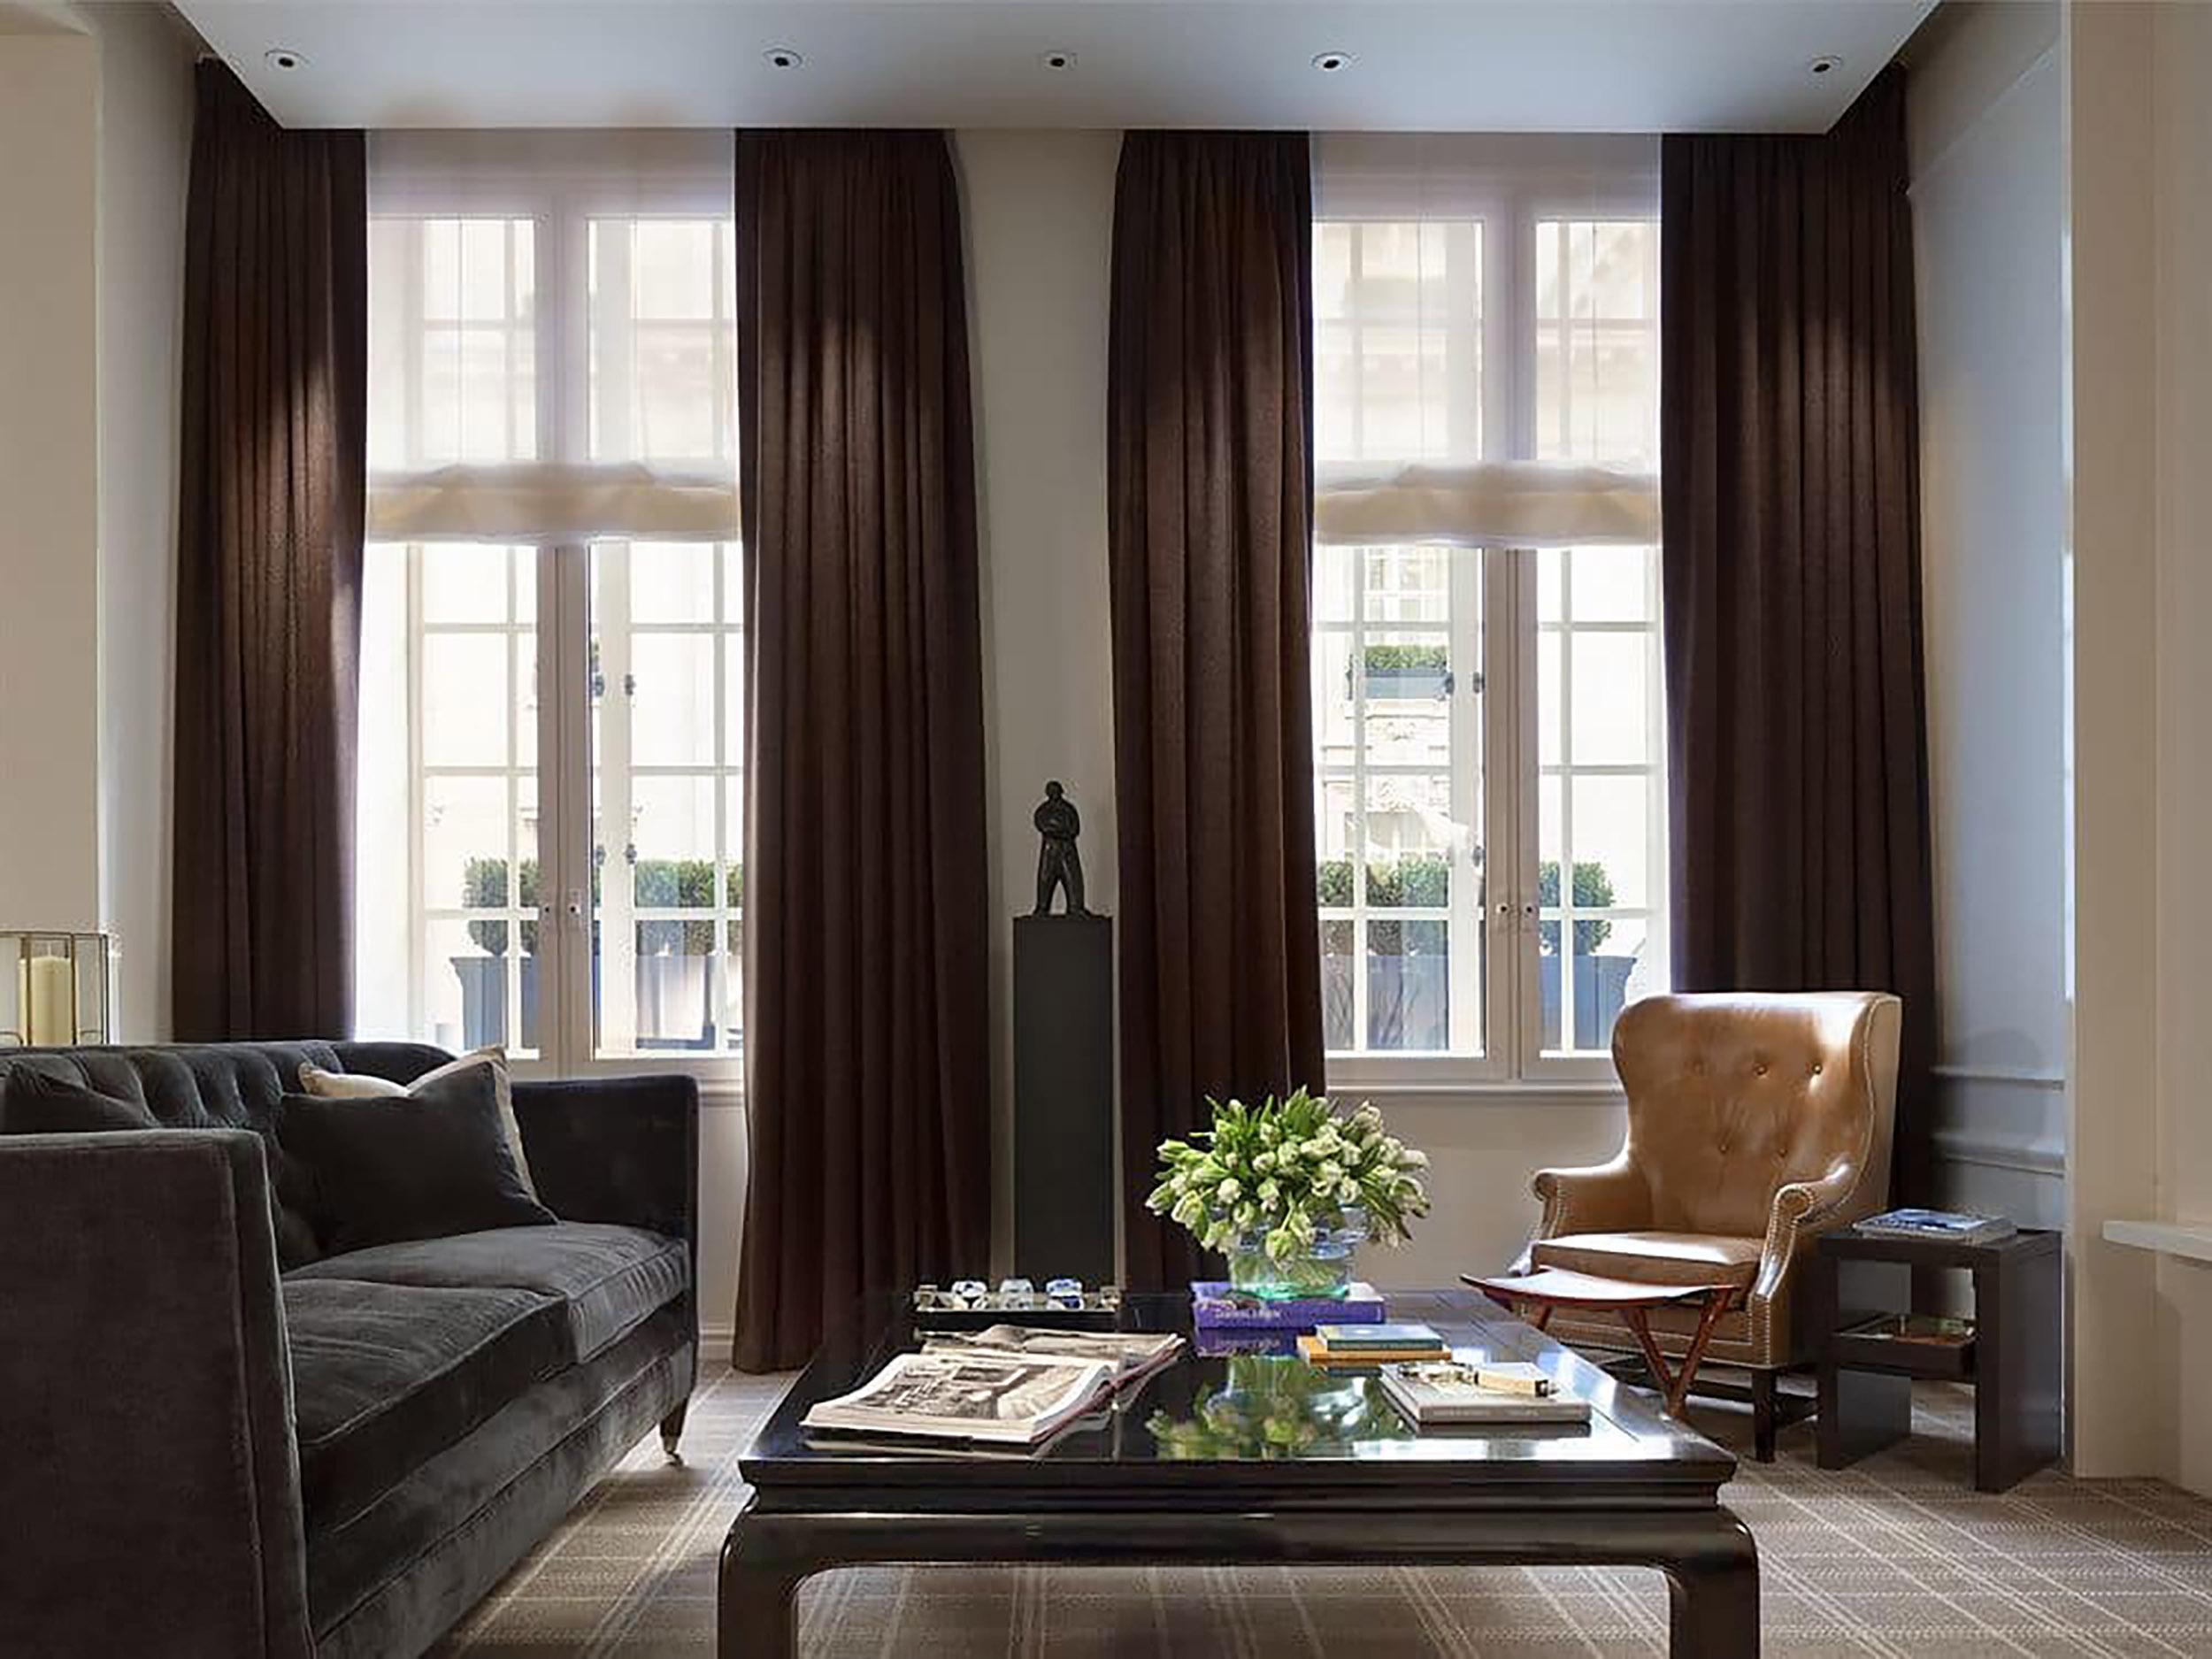 ....bespoke furniture   rosewood london : coffee table..特别定制家具   瑰丽伦敦酒店:咖啡台....